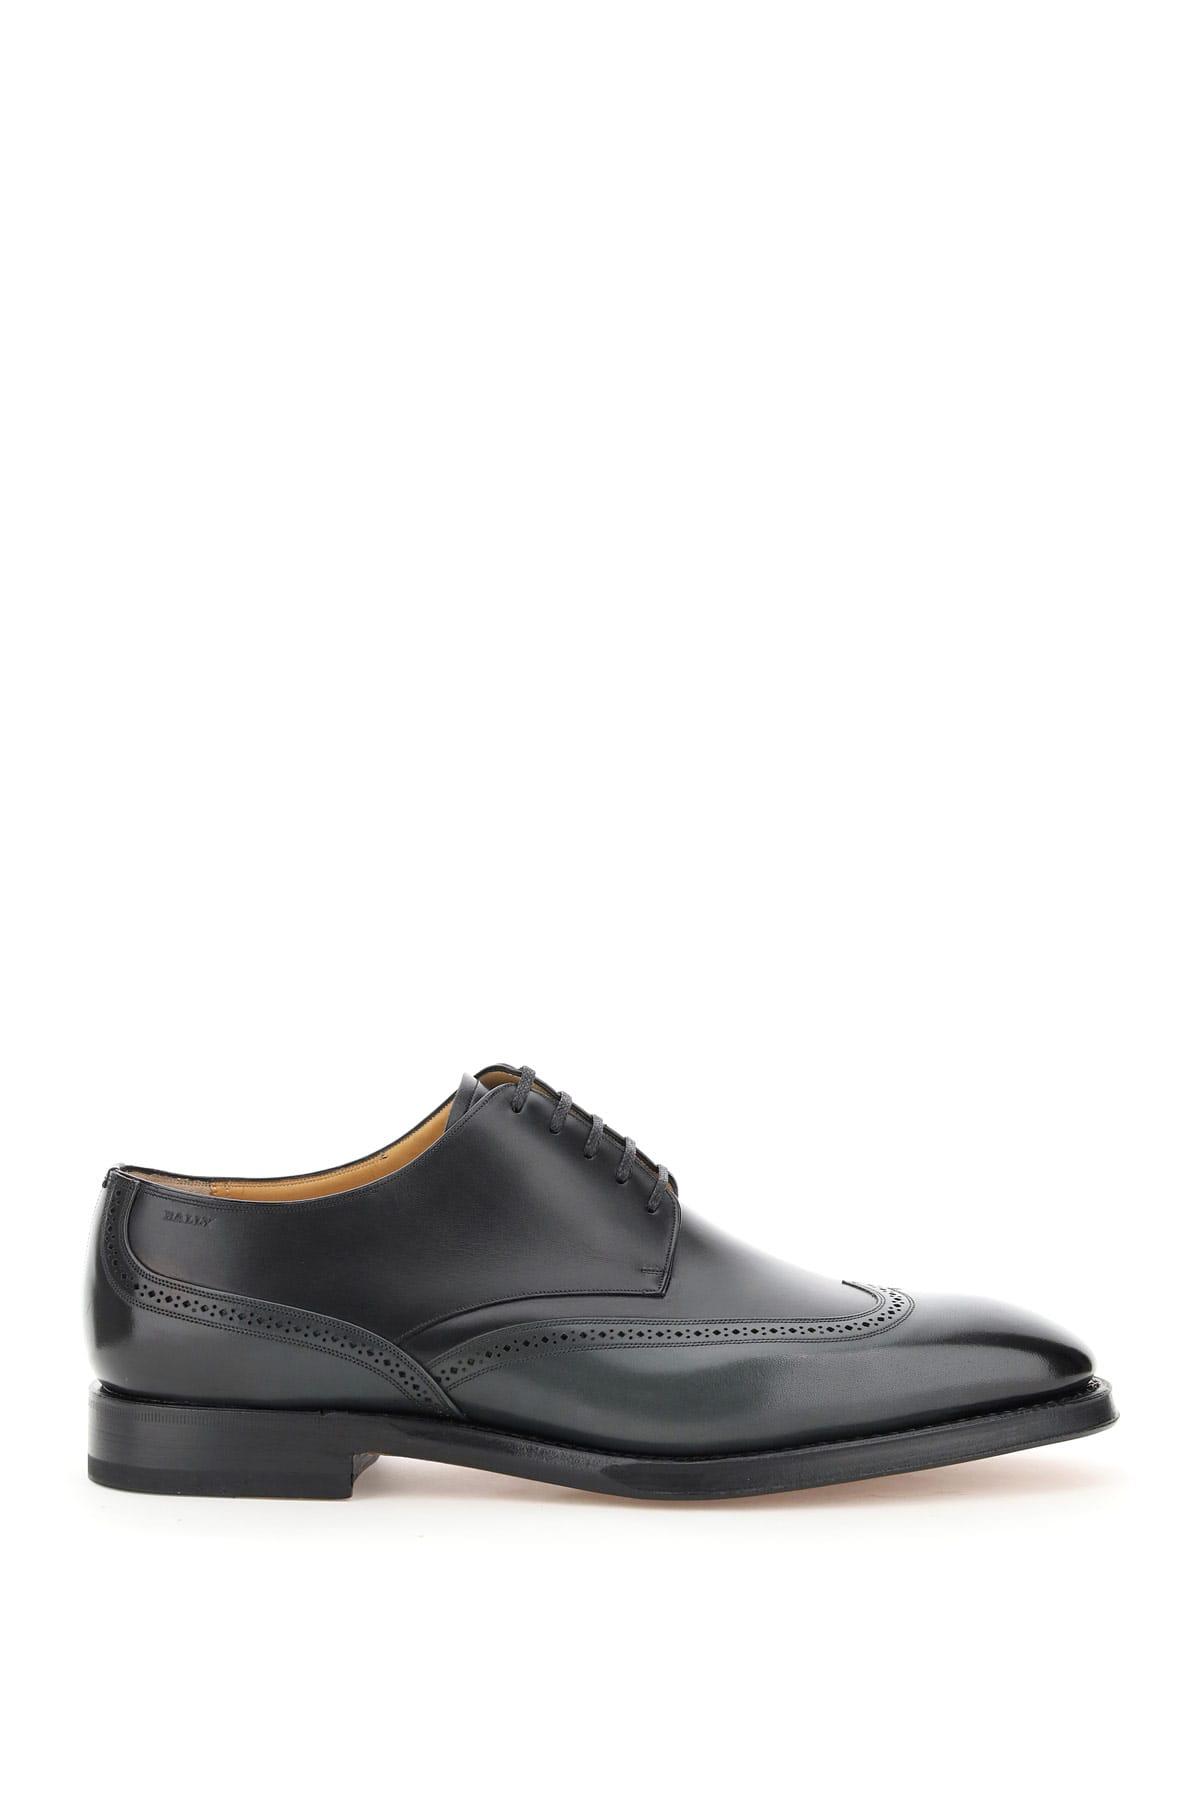 BALLY TIGHTEN SCONNY 8 Grey, Black Leather